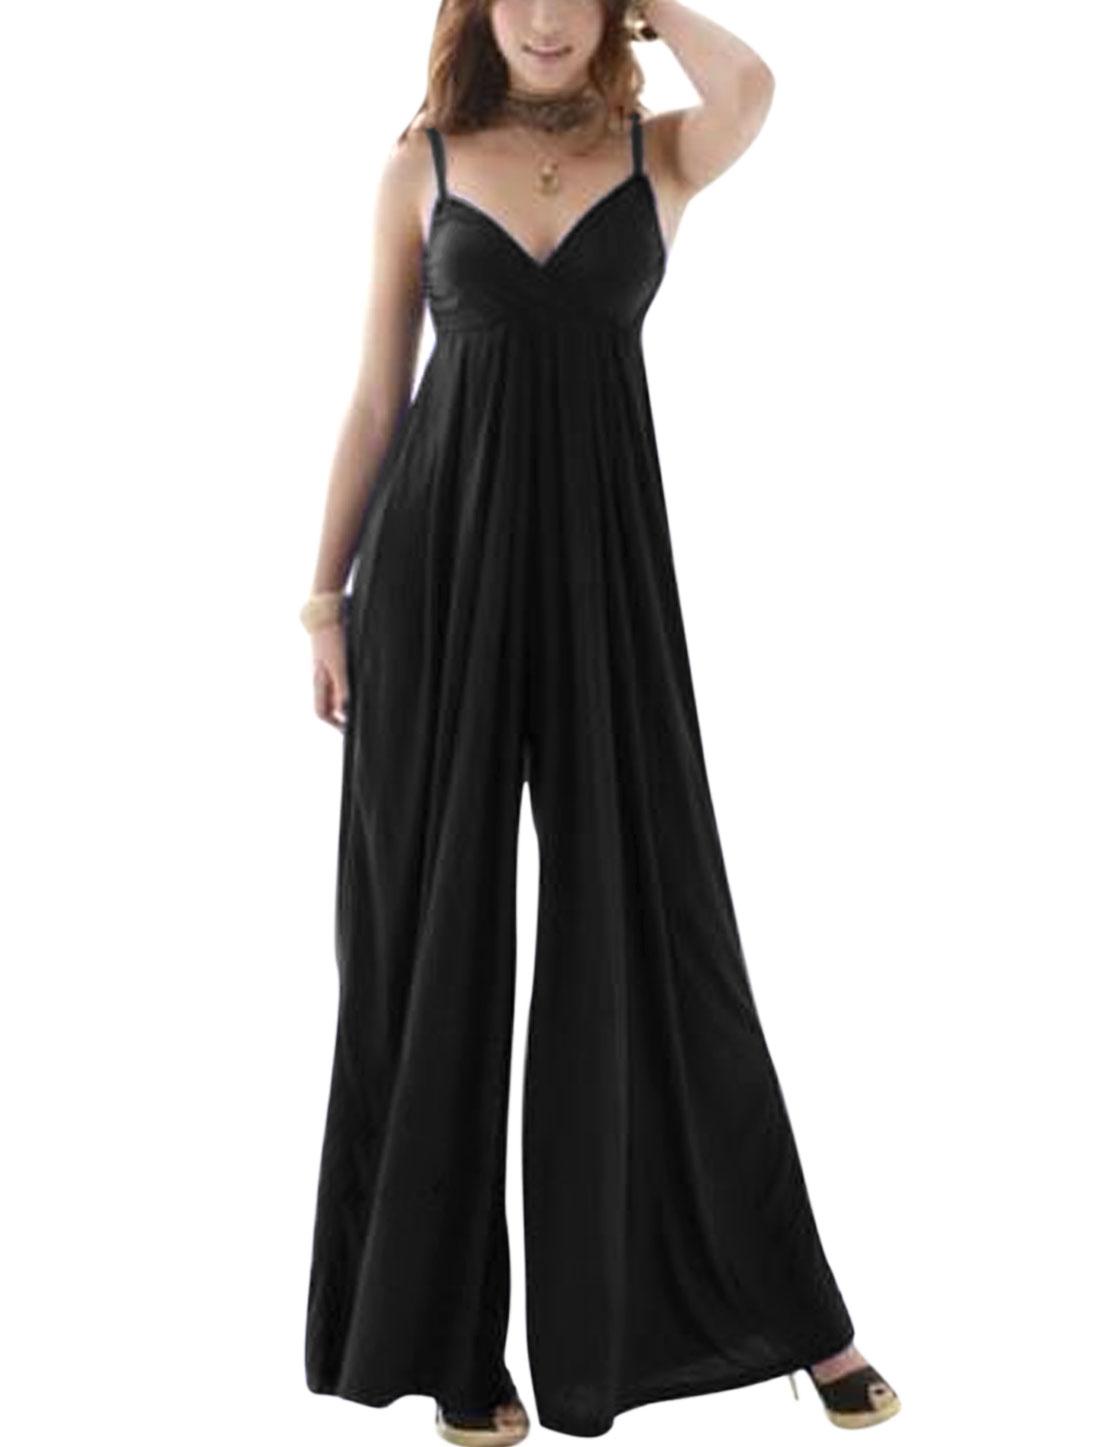 Women Sweetheart Neckline Padded Bust Backless Wide Leg Casual Jumpsuit Black XS